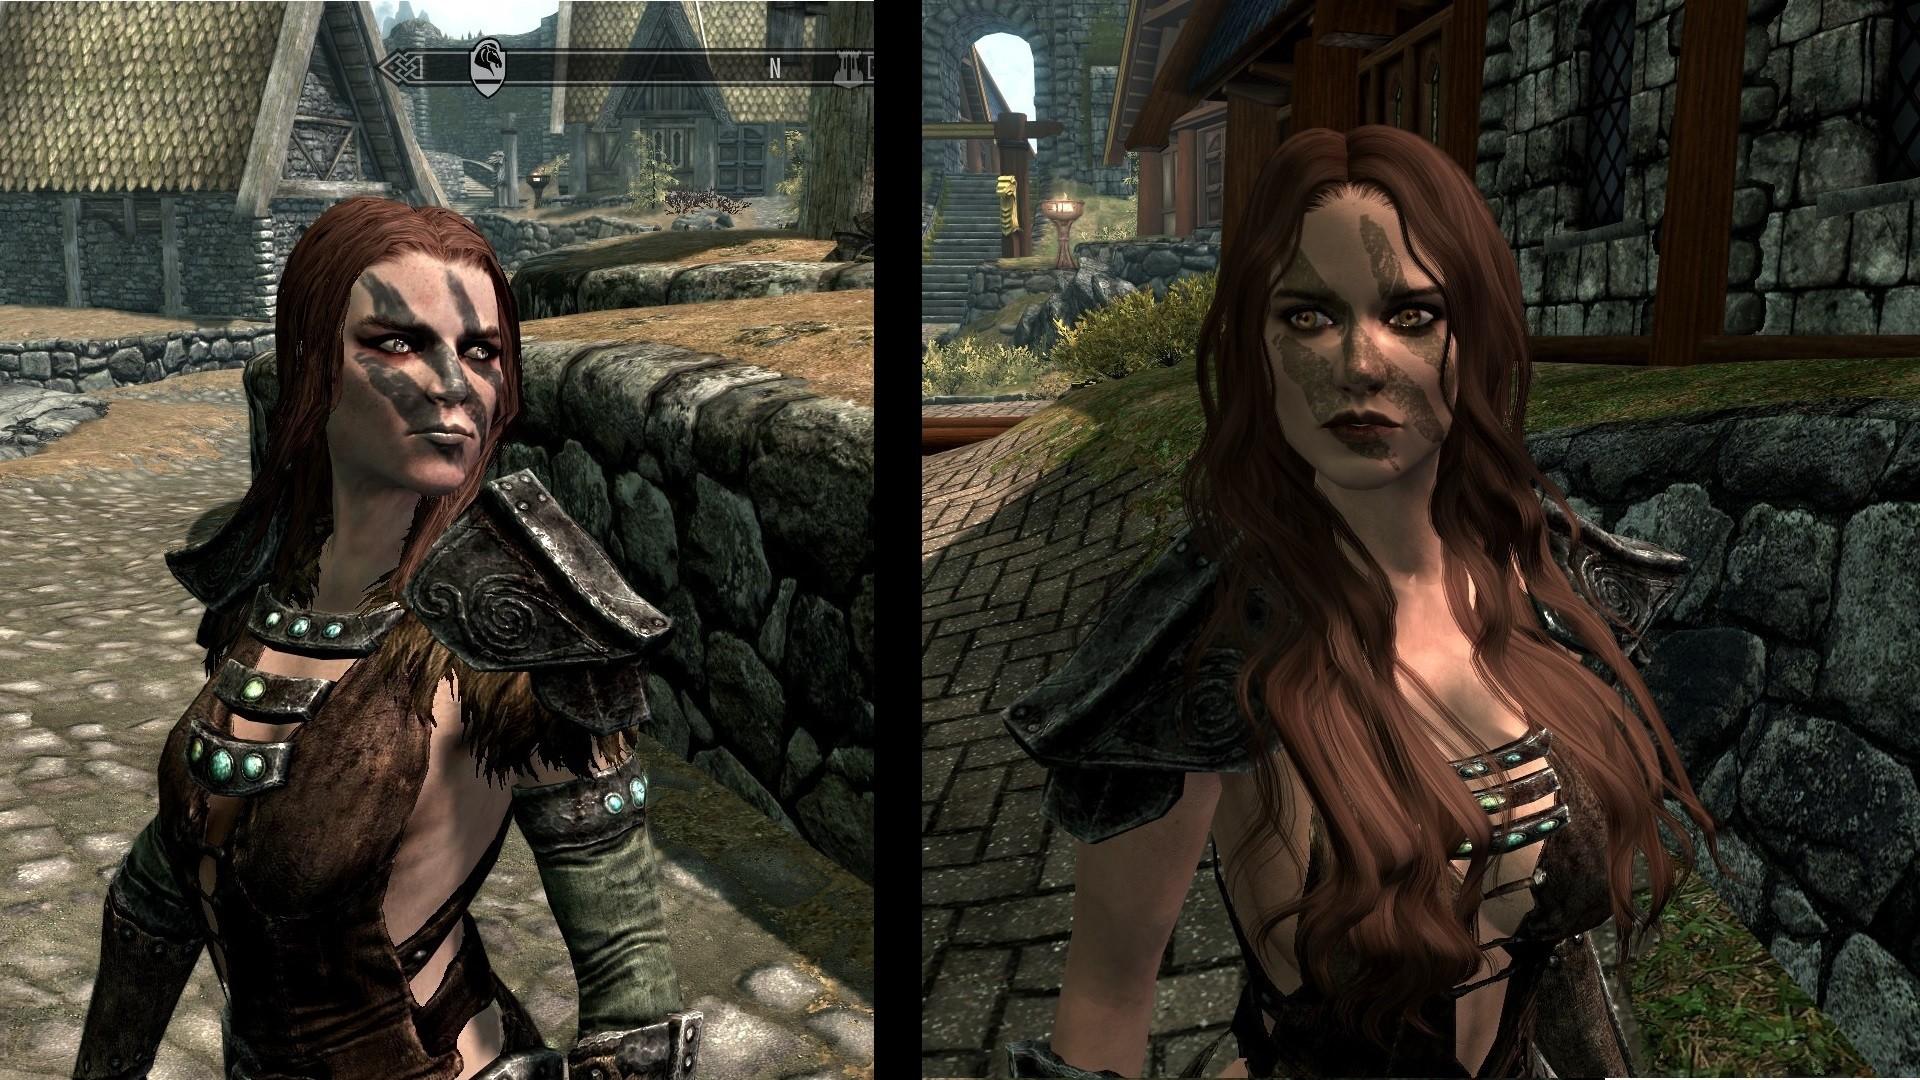 Skyrim Female NPCs: Original vs. Modded